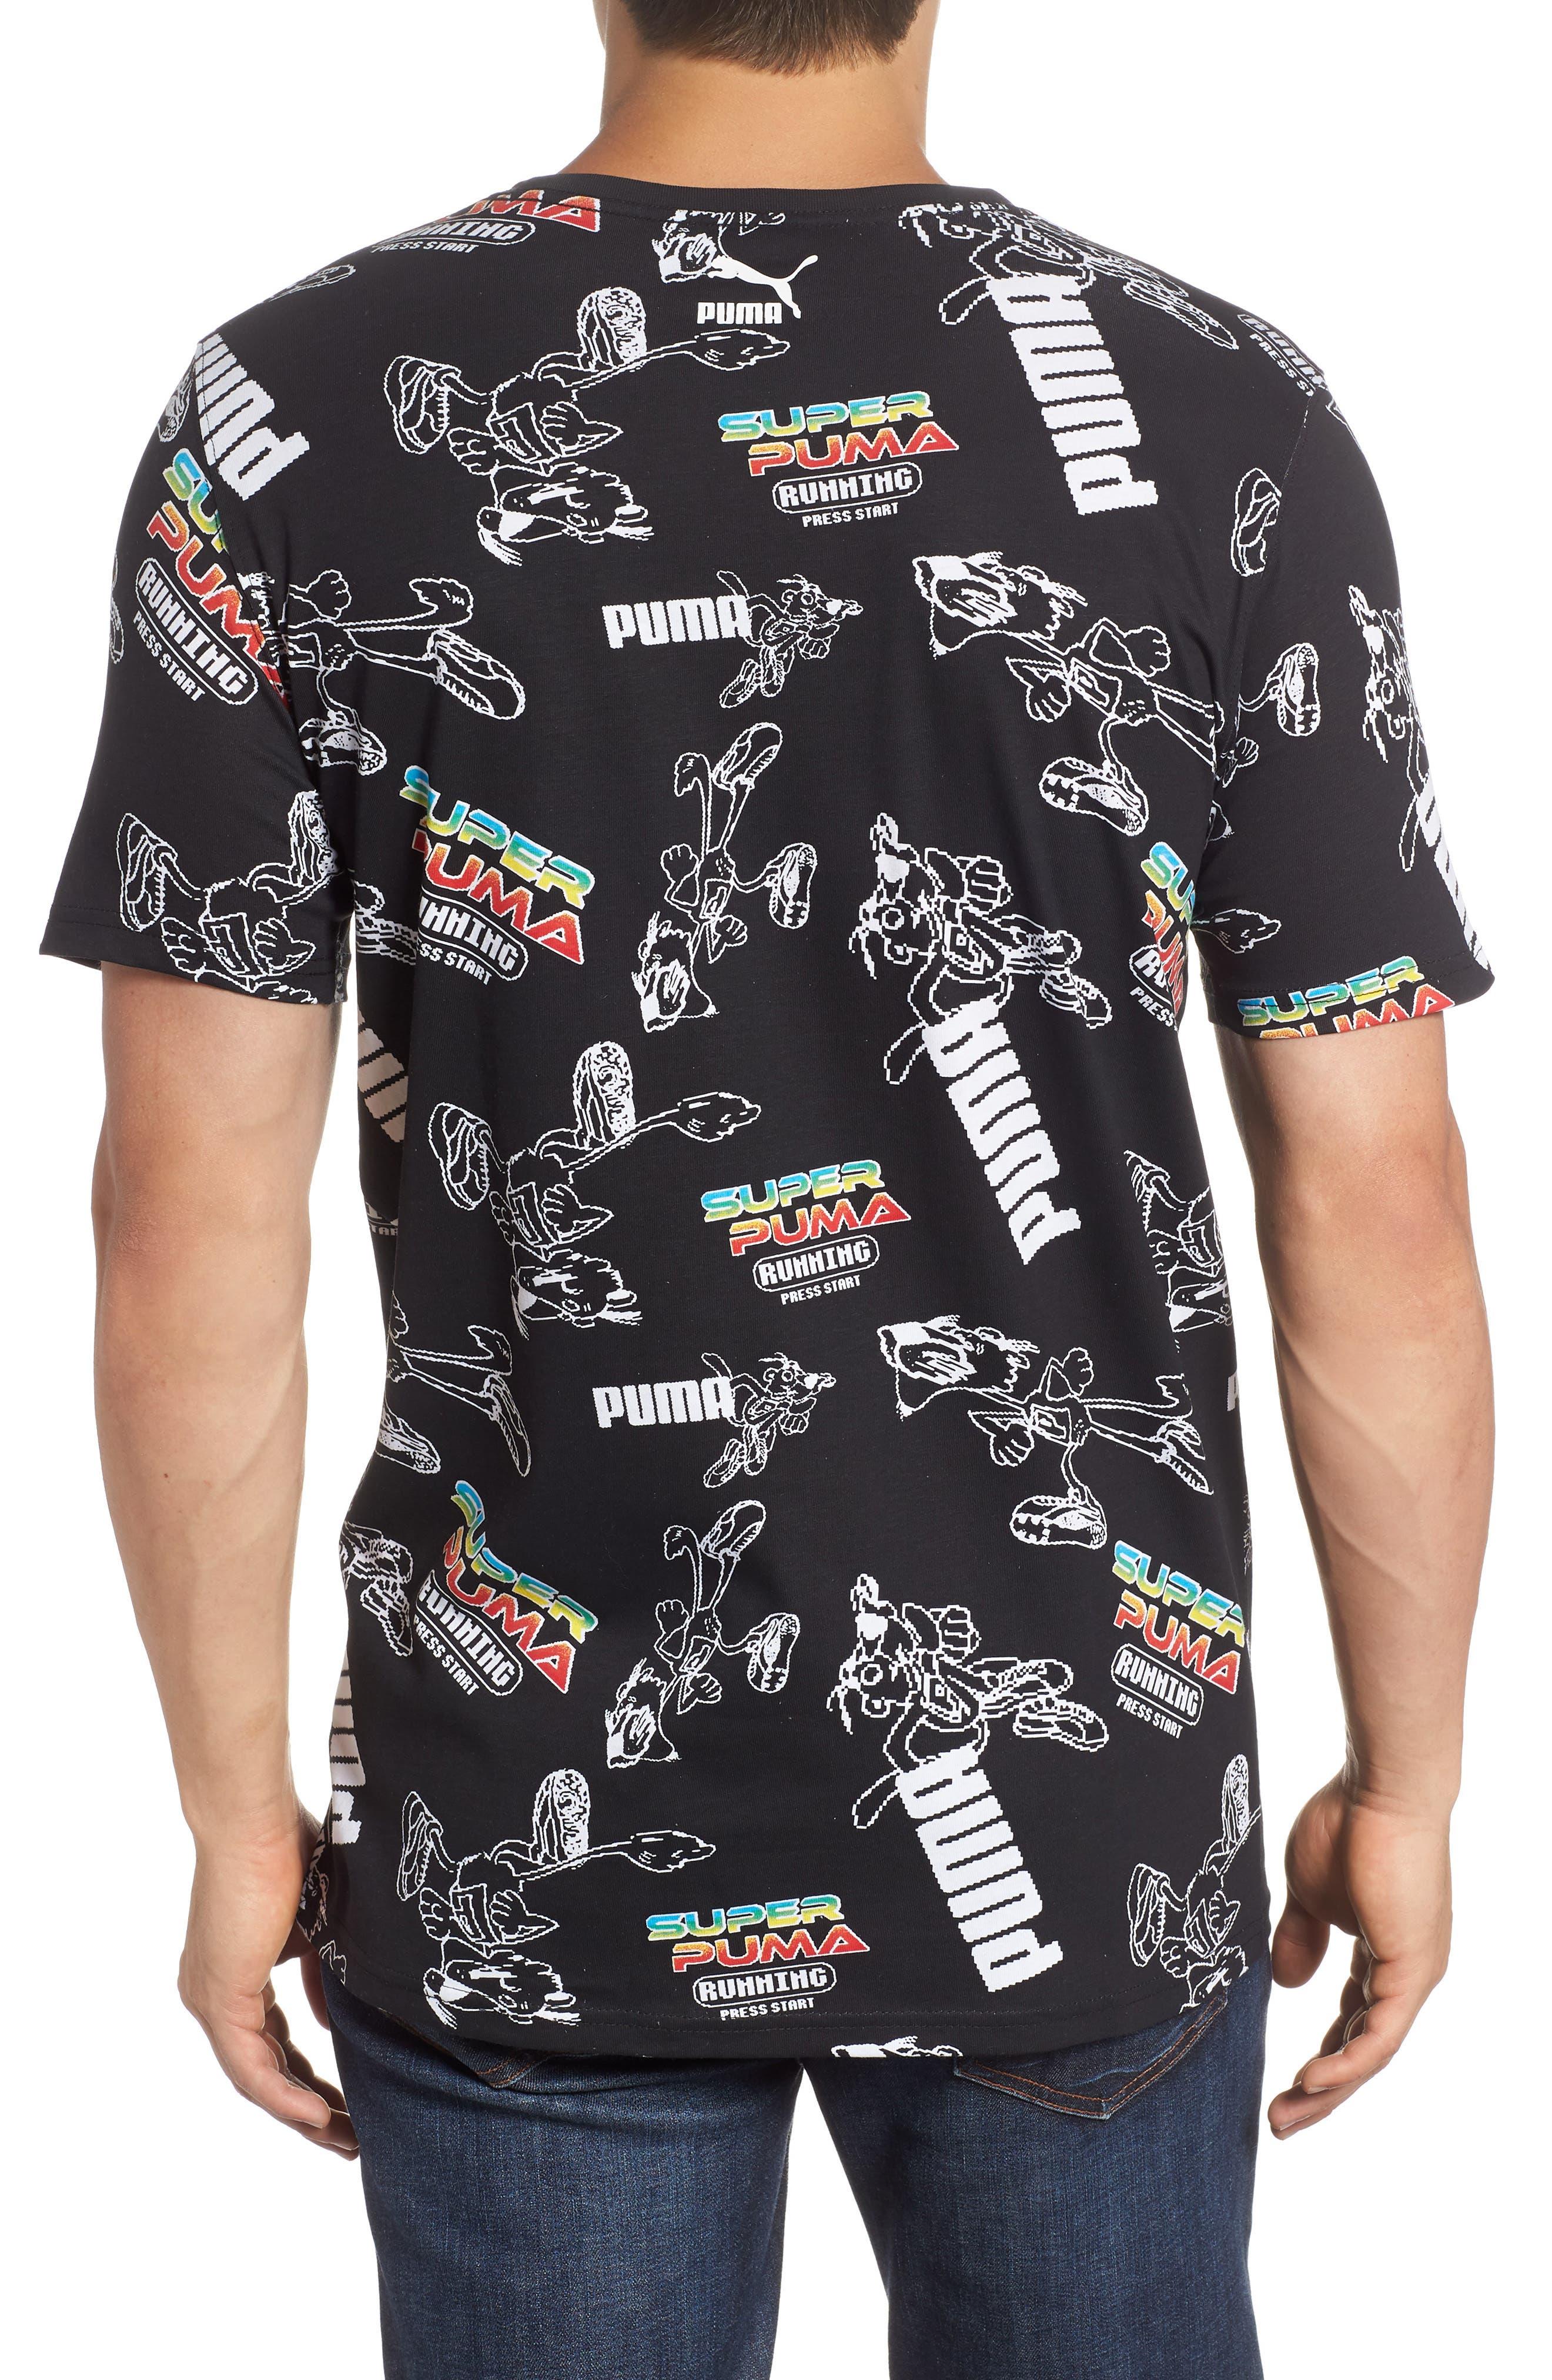 Super PUMA Regular Fit T-Shirt,                             Alternate thumbnail 2, color,                             COTTON BLACK